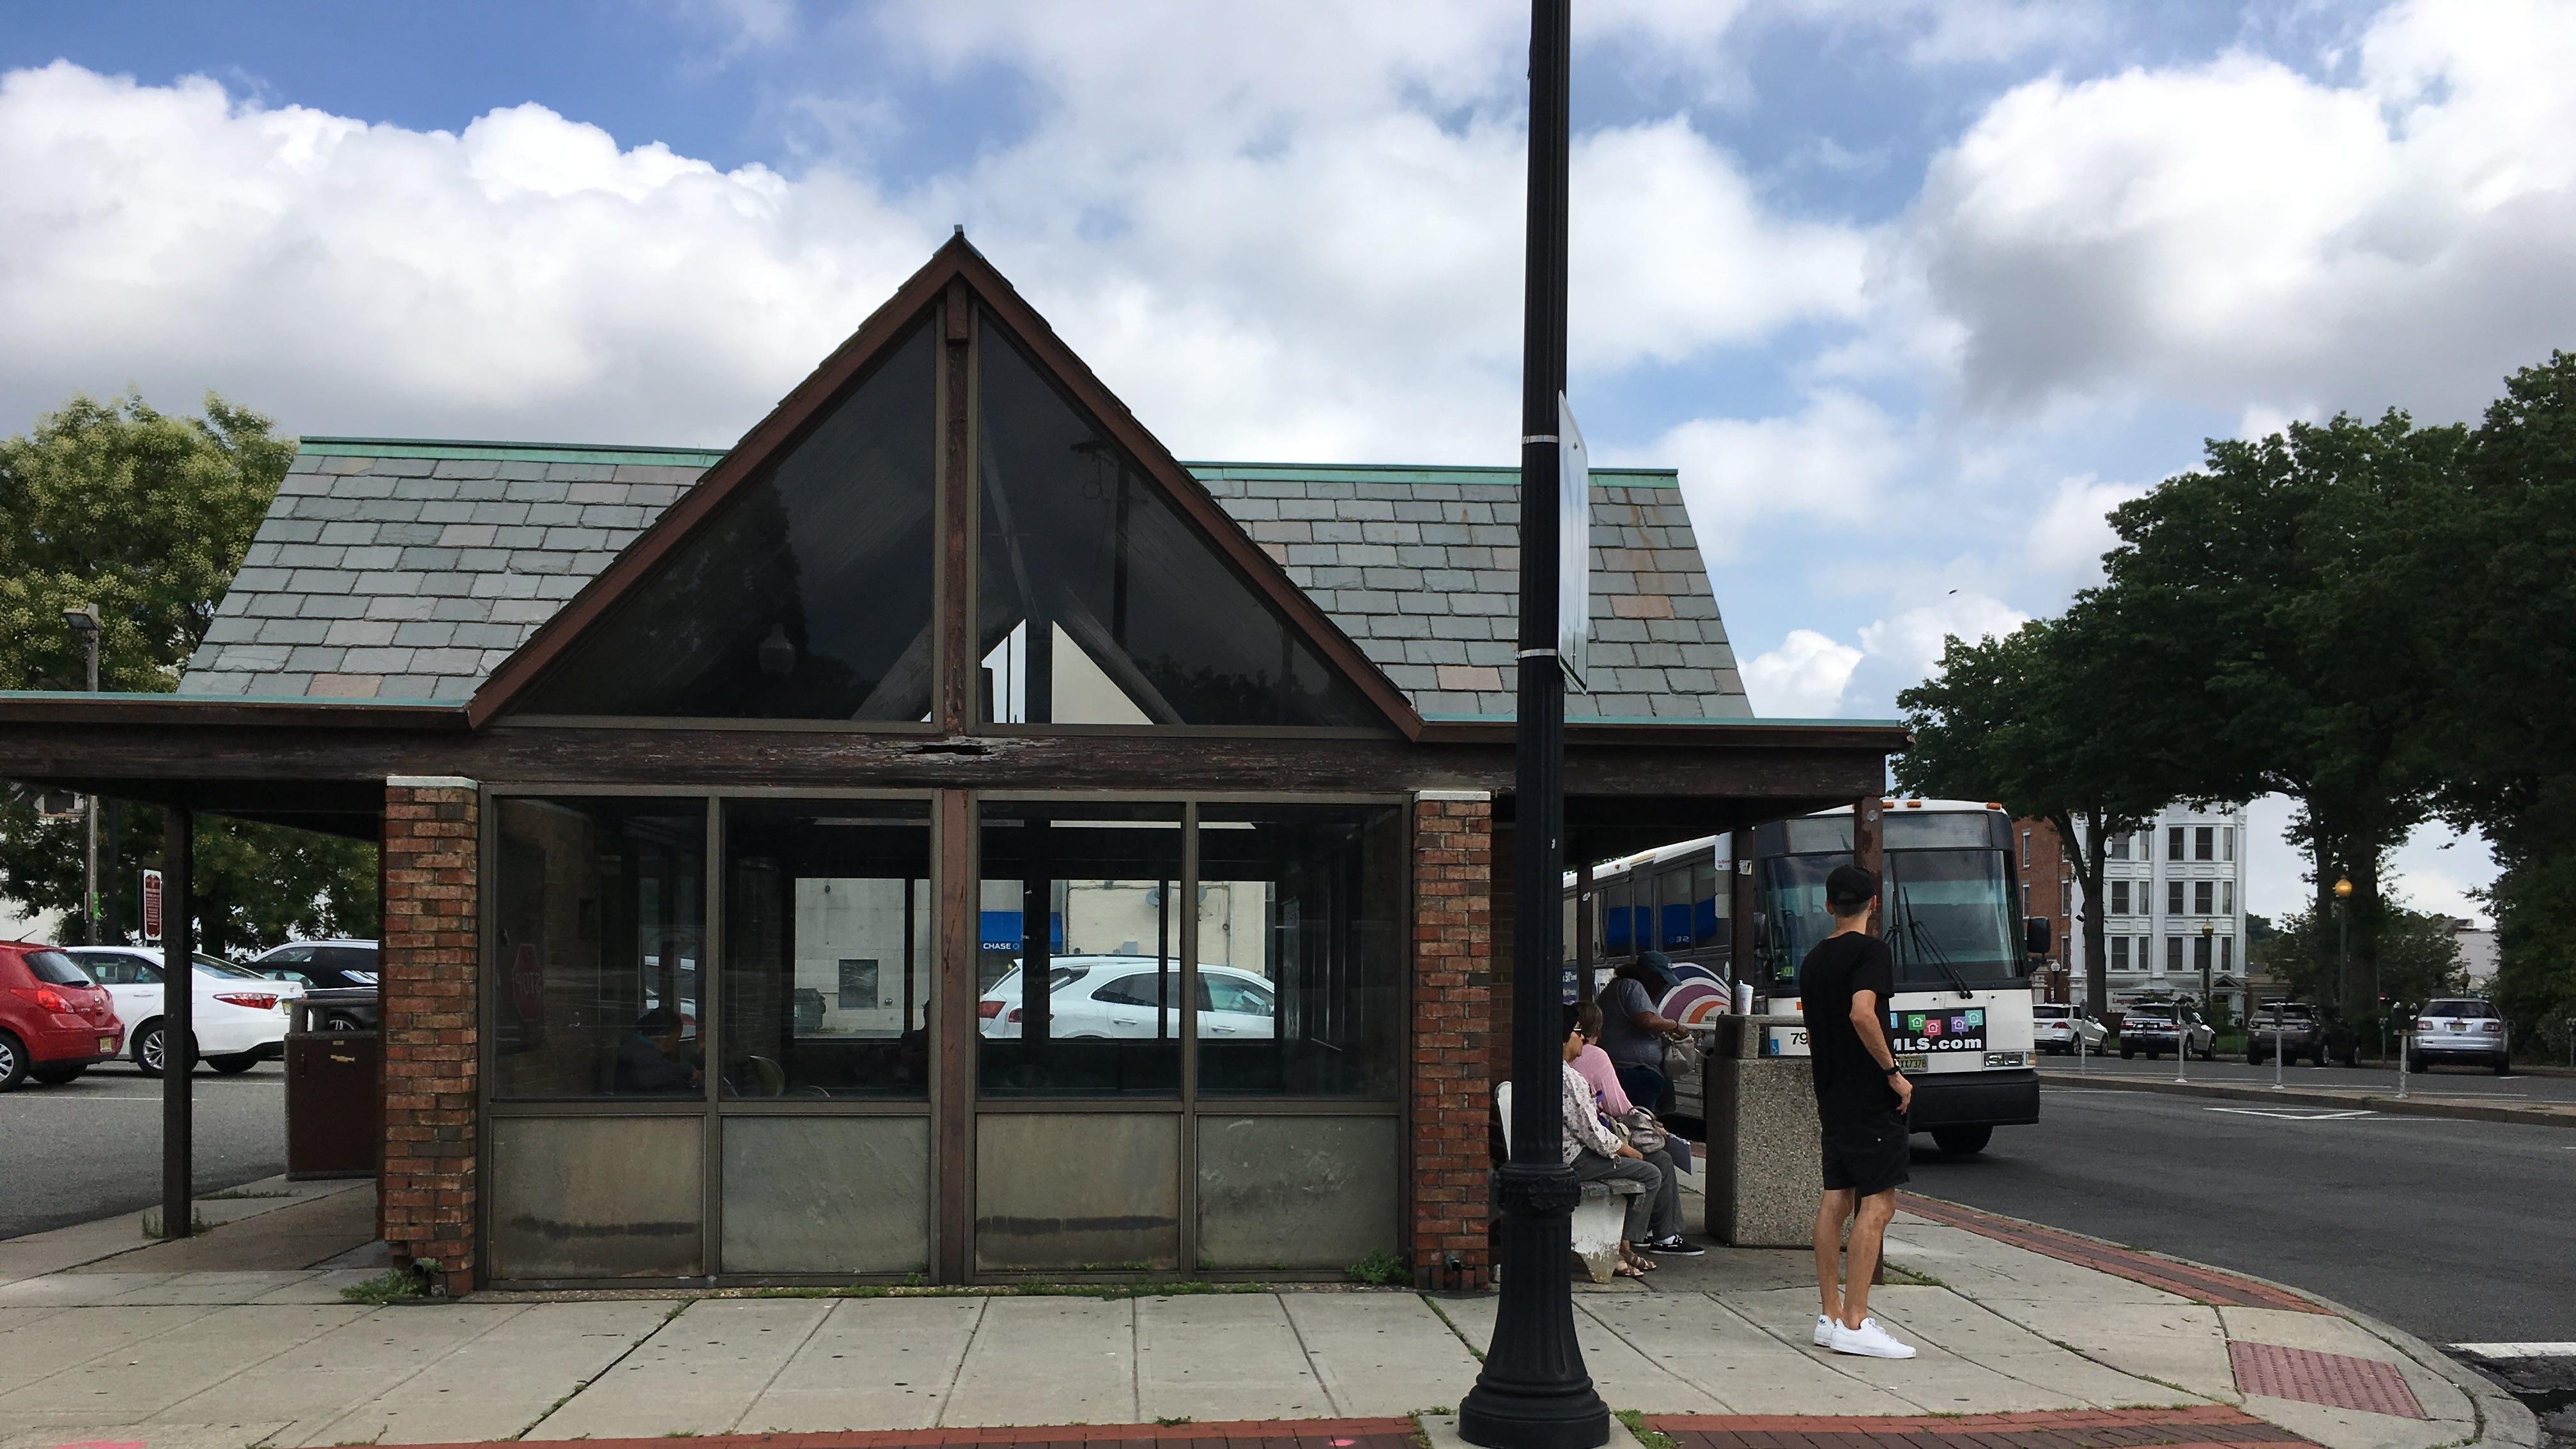 NJ Transit to replace run-down bus shelter at Ridgewood's Van Neste Square